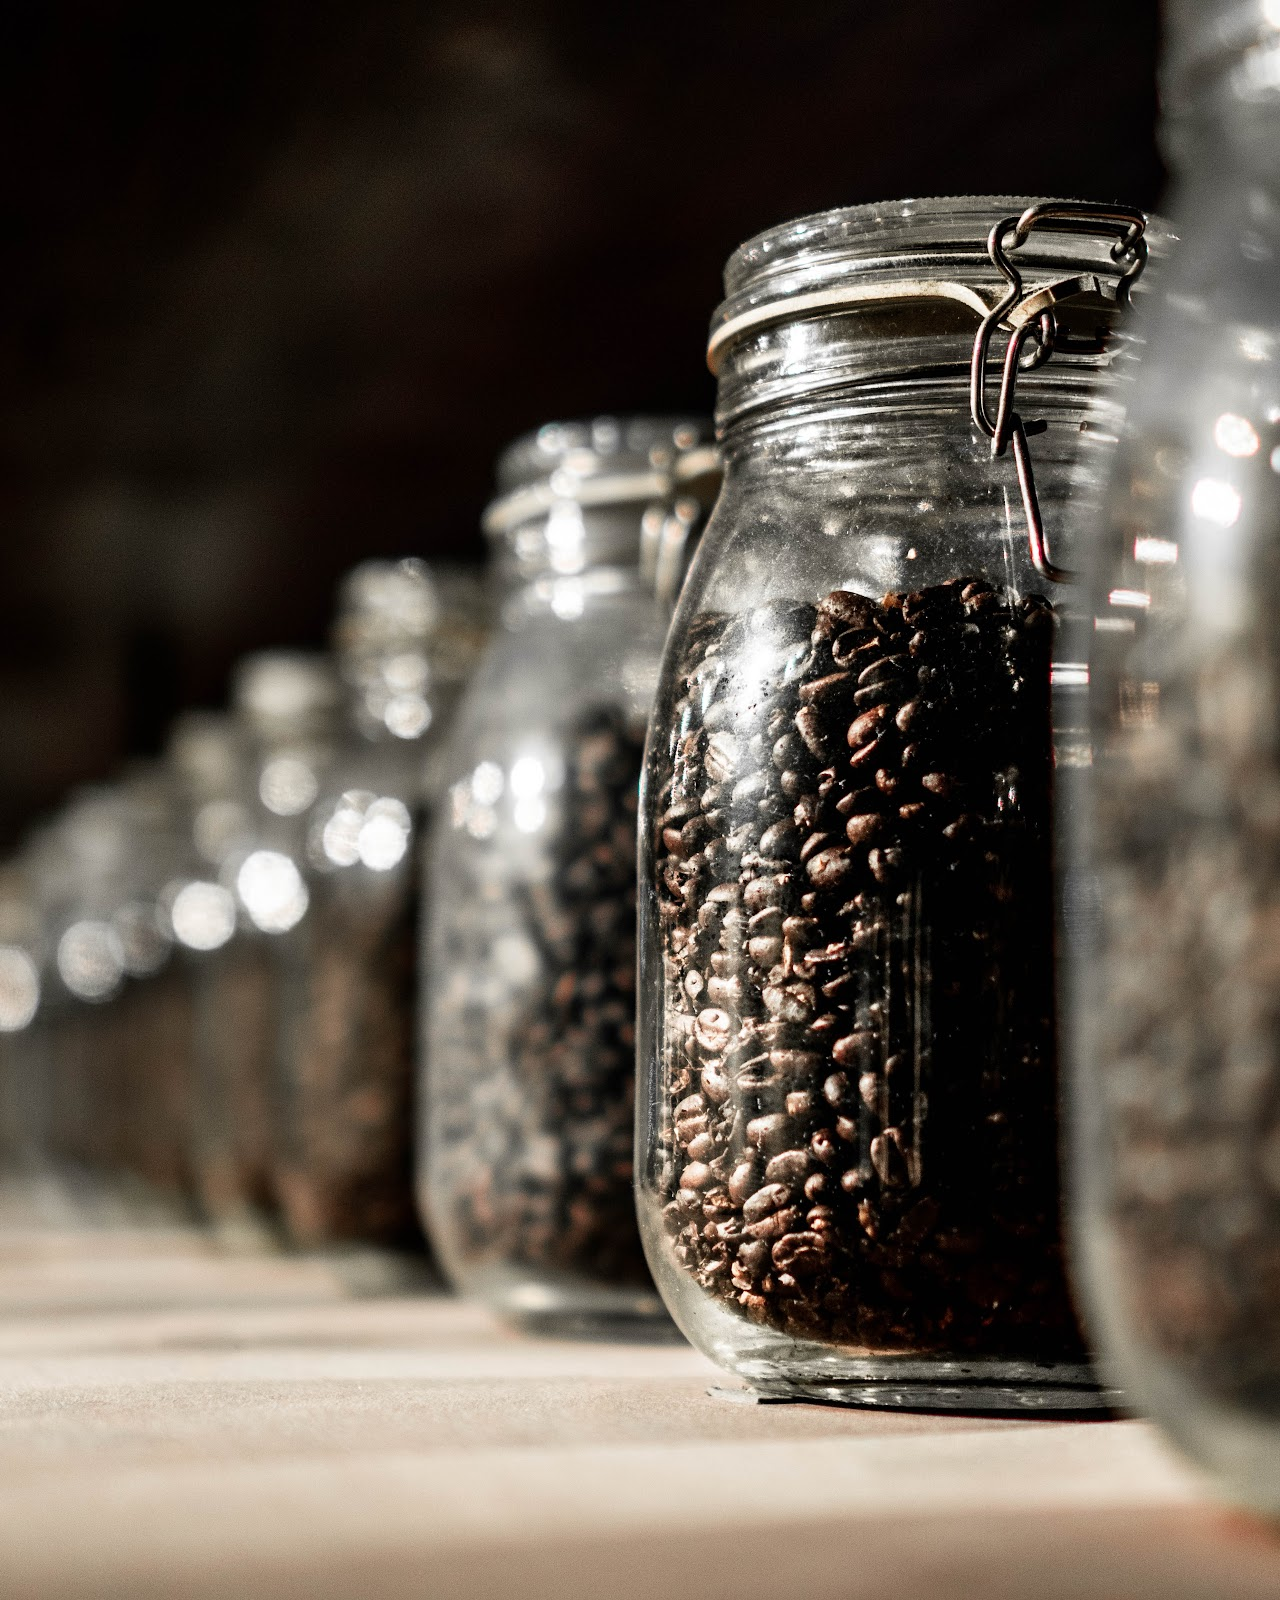 Jars of roasted coffee beans